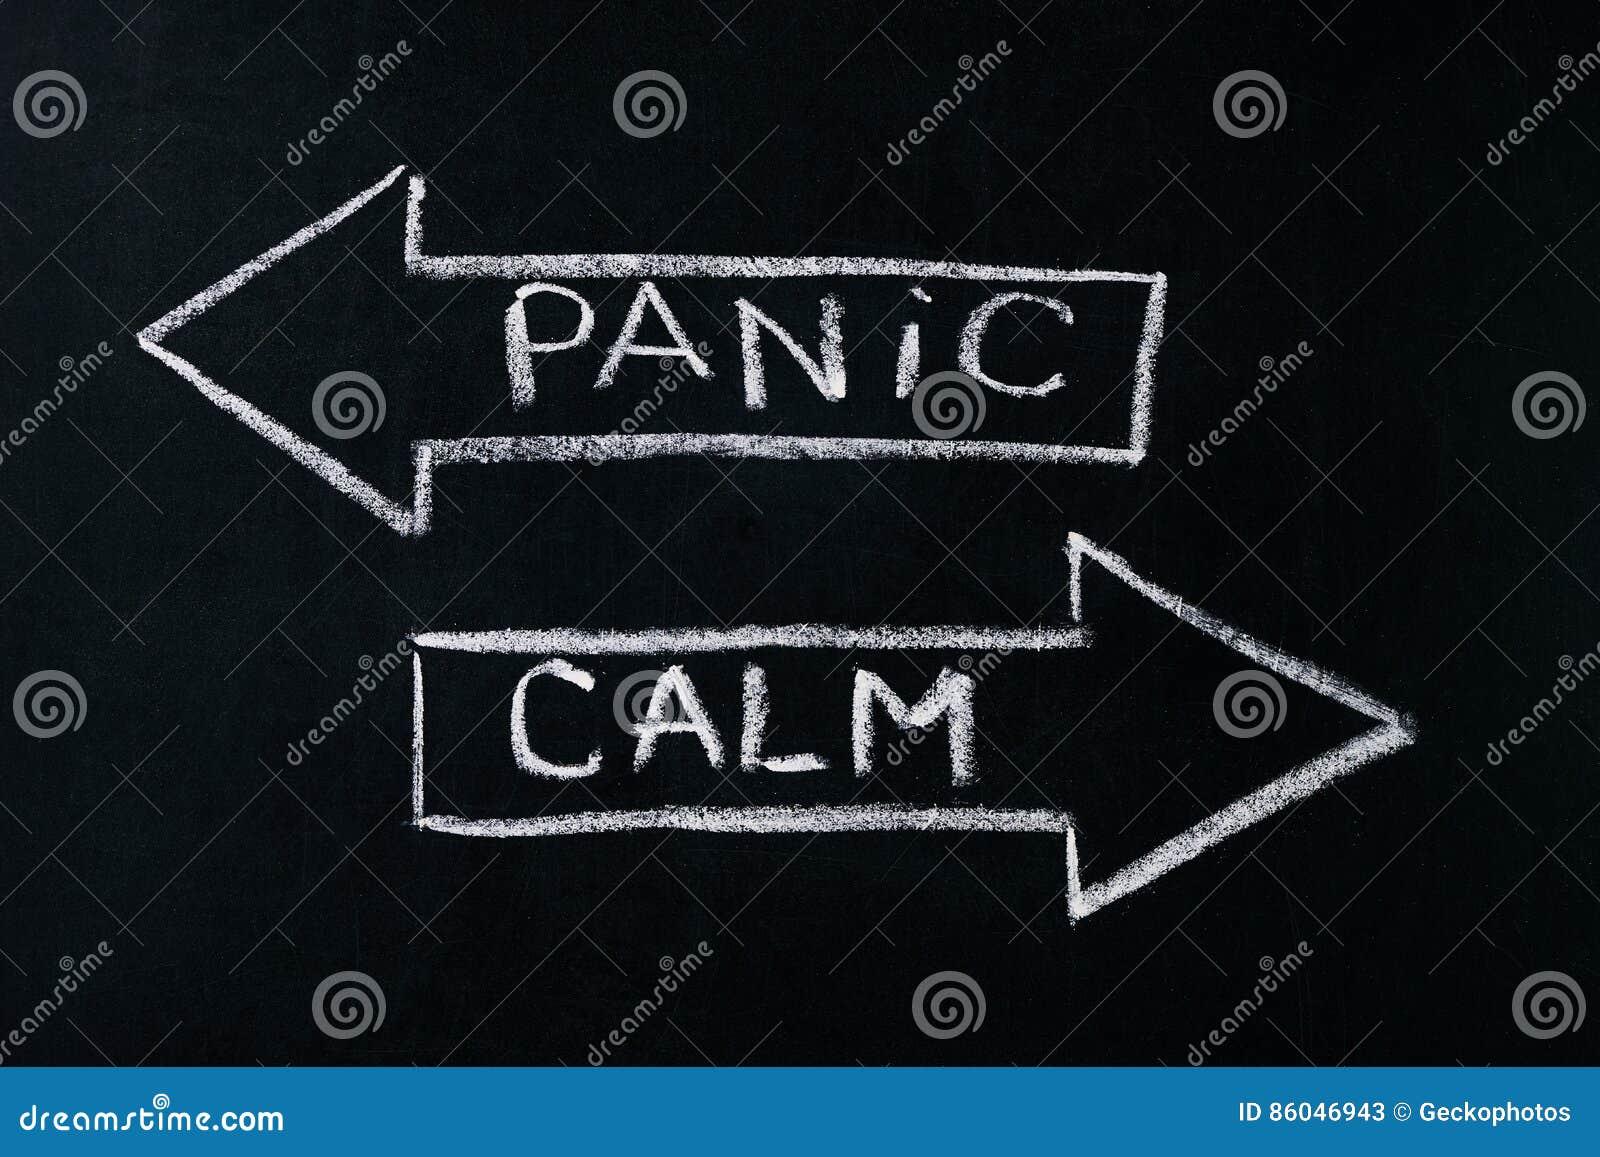 Panic or calm